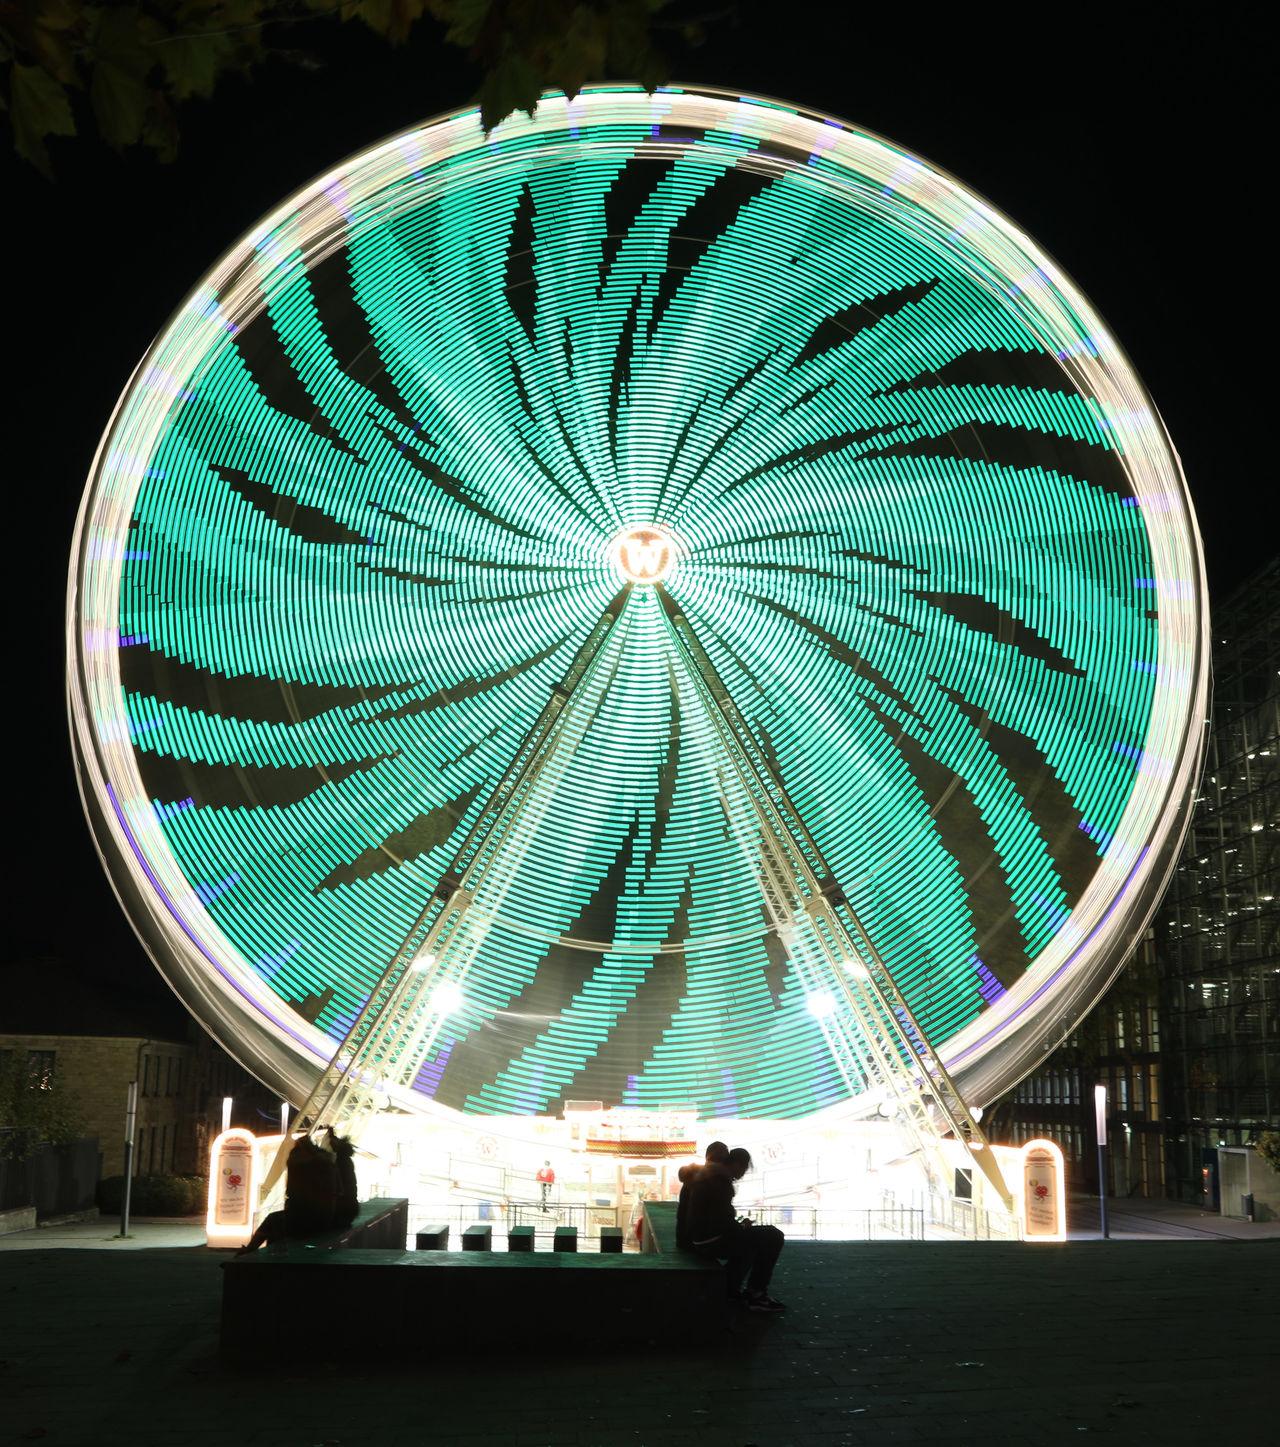 Essen Essen Light Festival 2016 Ferris Wheel Green Color Illuminated Langzeitbelichtung Long Exposure Spinning Web